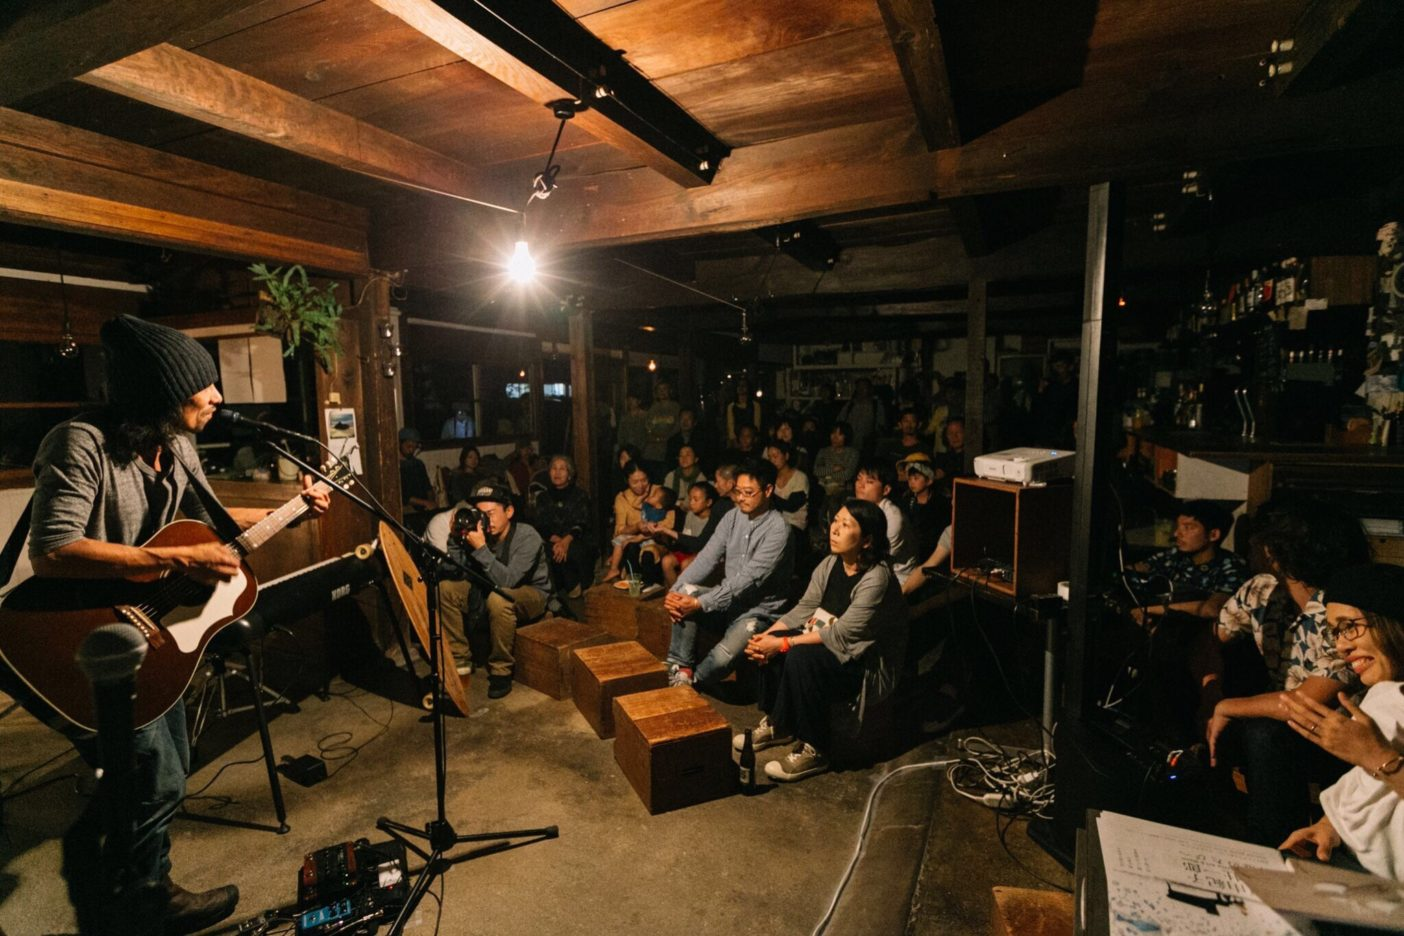 Photo: junpei nakayama